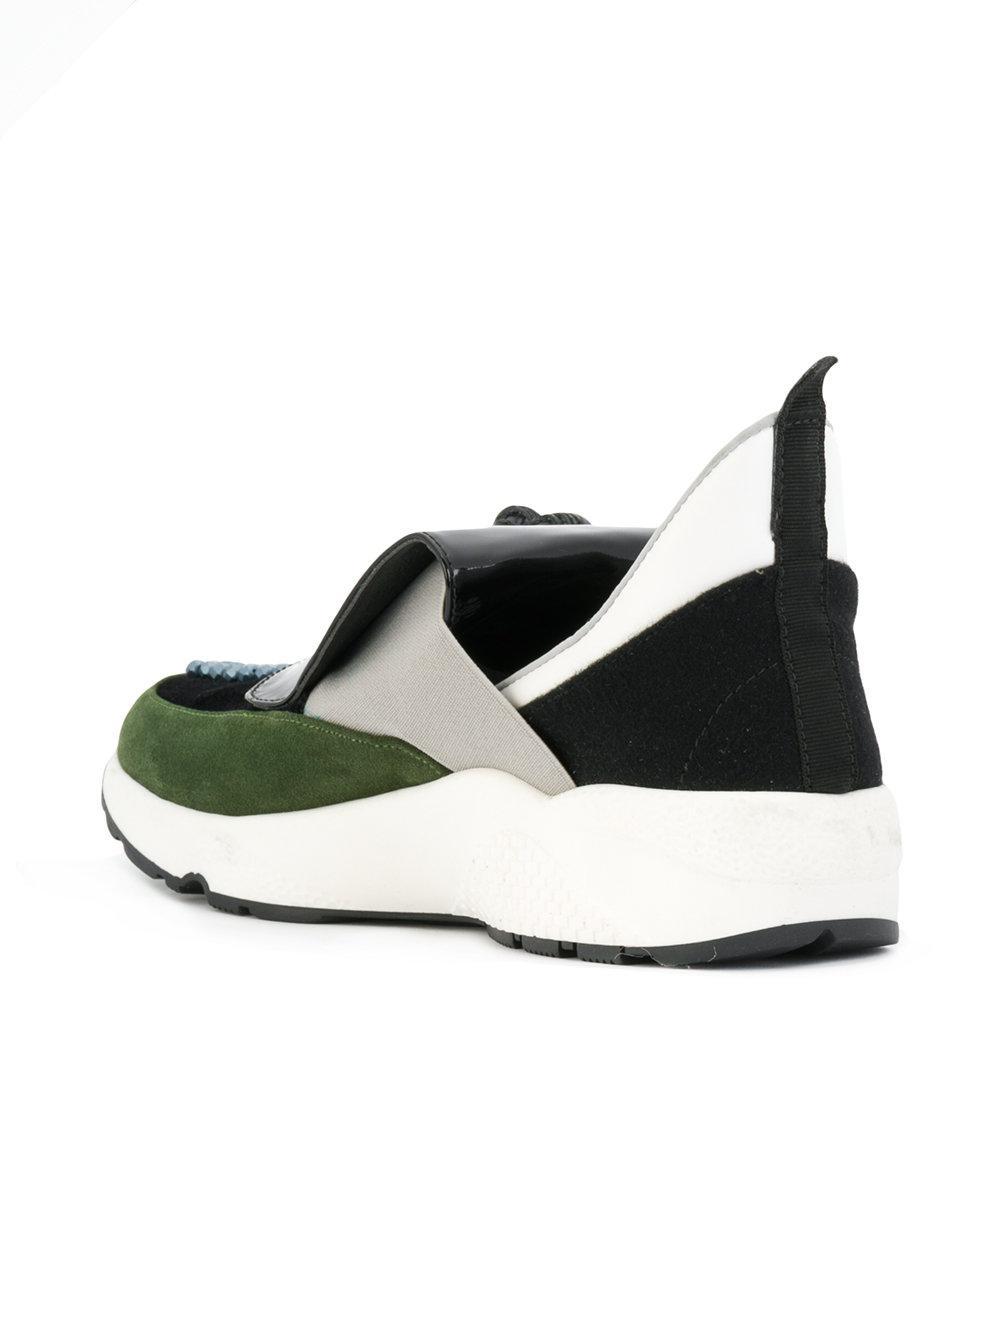 Lyst - No Ka  Oi Tassel Sneakers in Black cf623c6fa